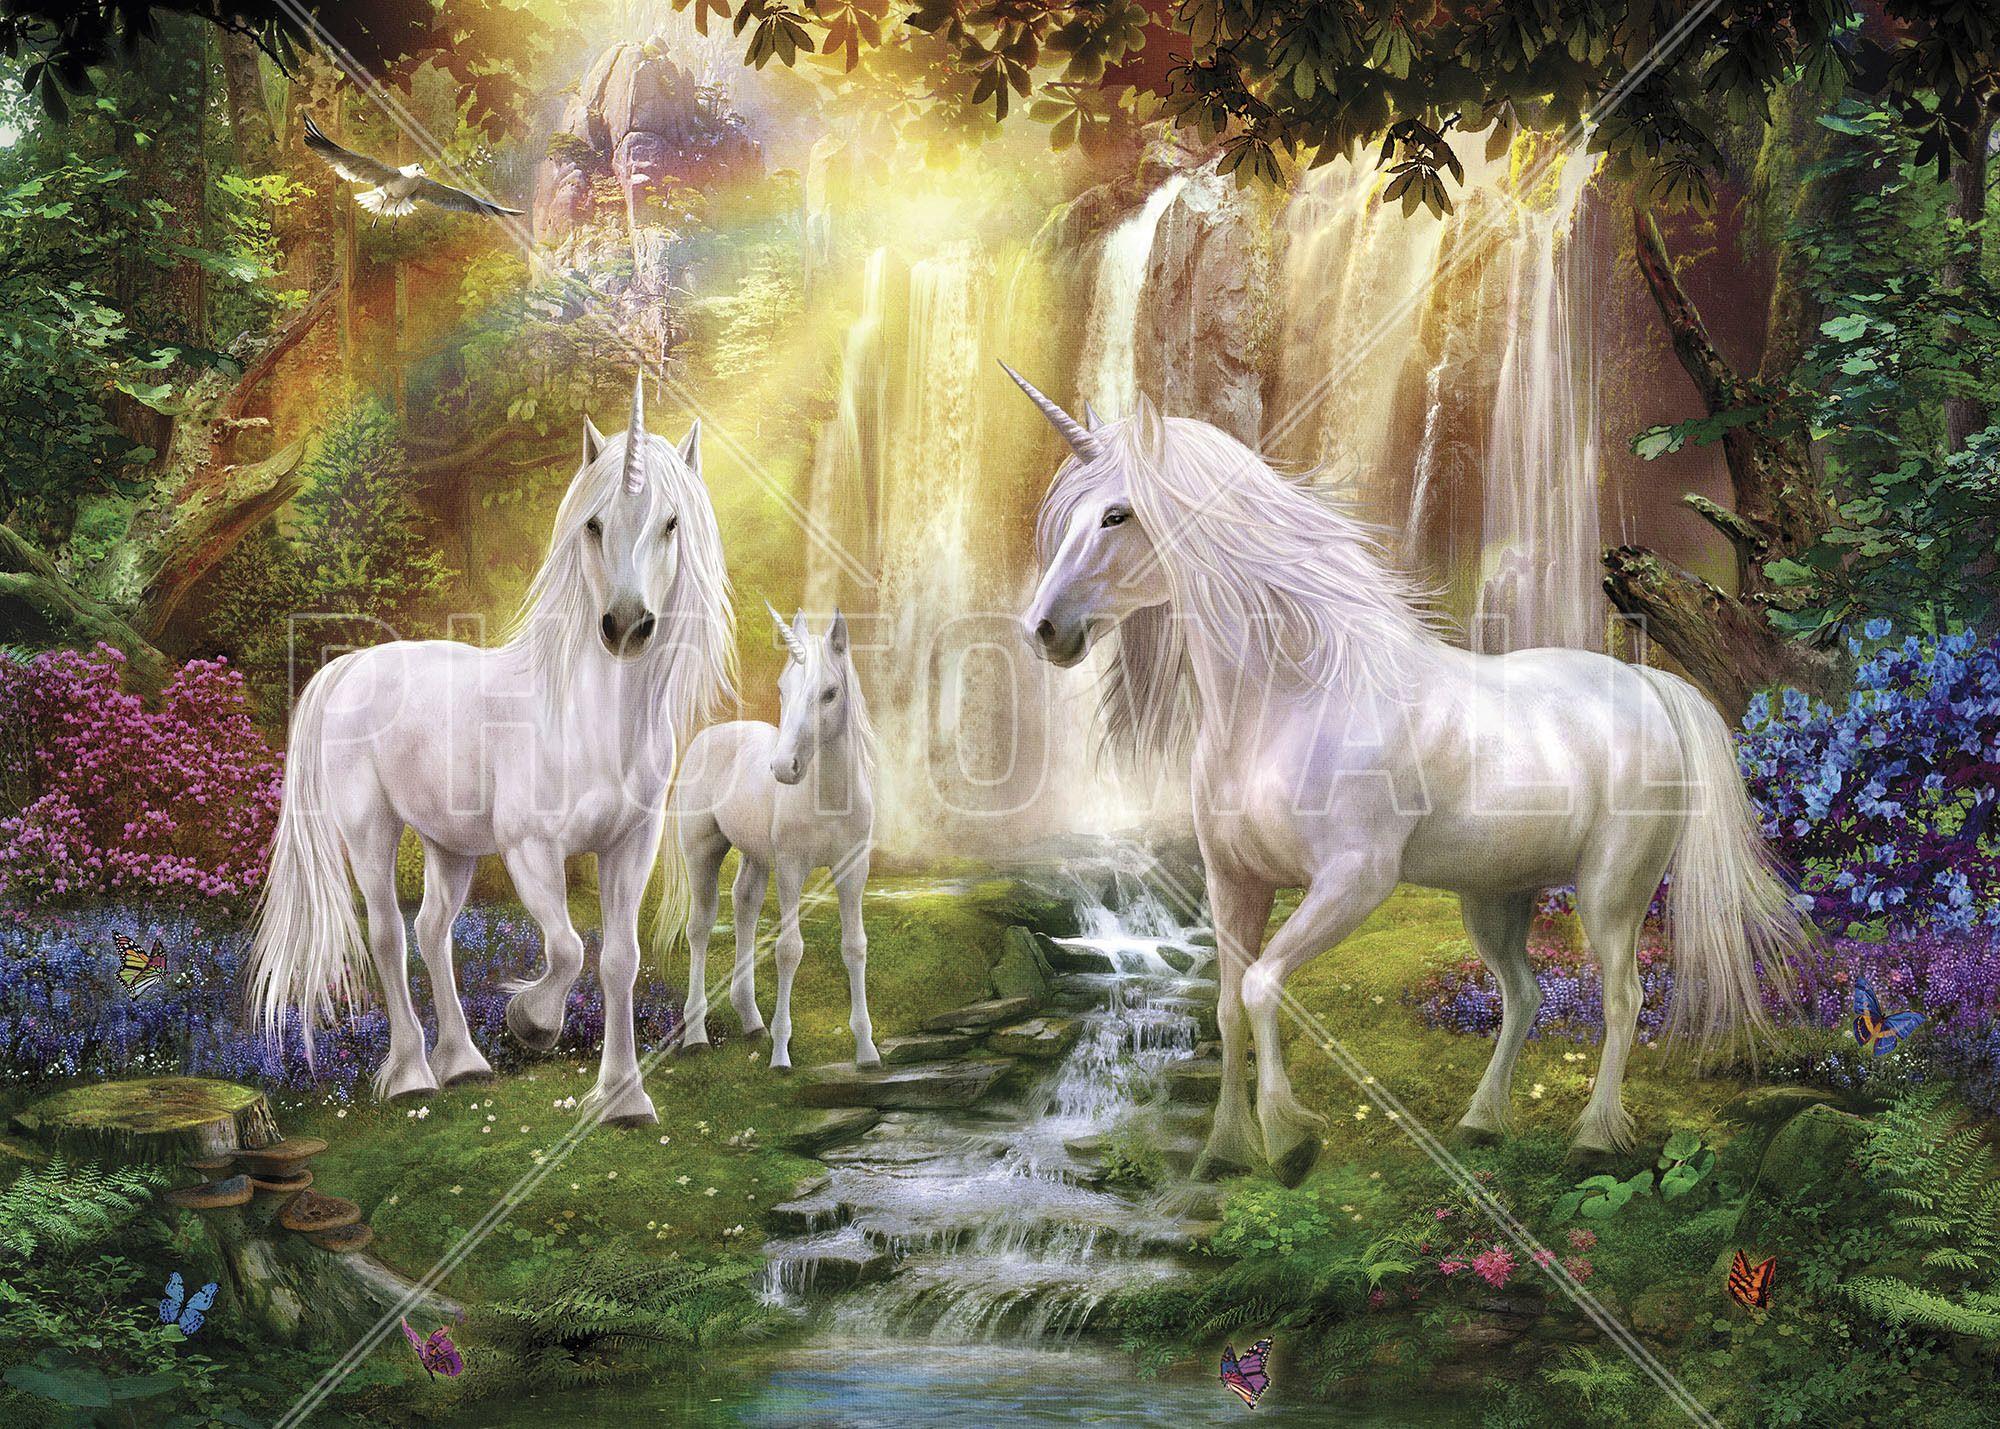 Waterfall Glade Unicorns - Fototapeten & Tapeten - Photowall